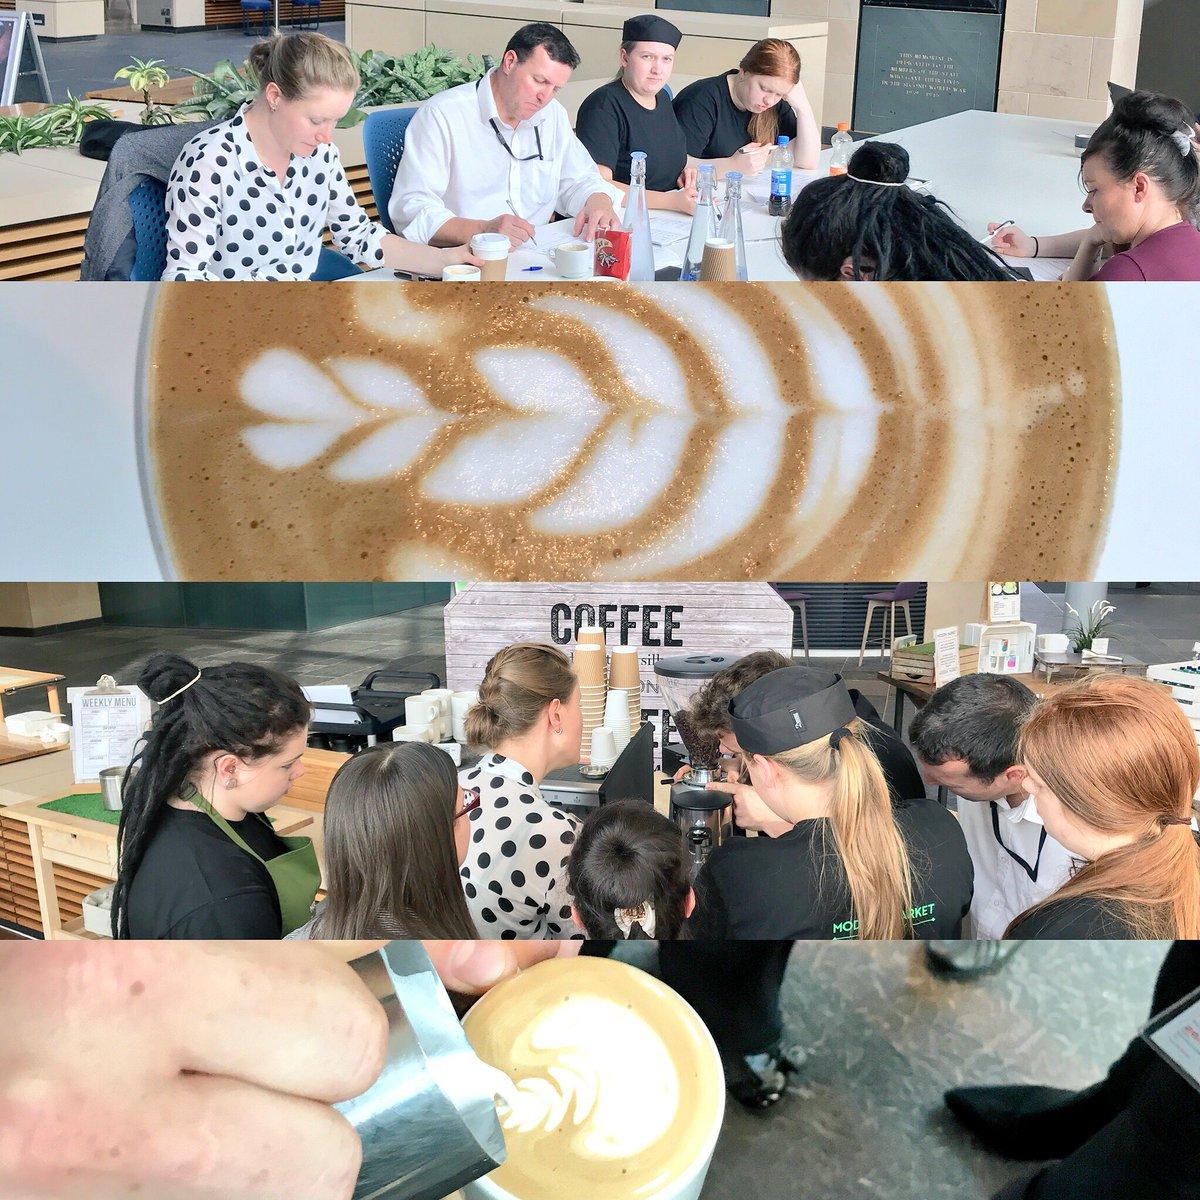 Barista skills foundation up north! #BL1 #Edinburgh #beanlearning<br>http://pic.twitter.com/b5FmmNo5Ow